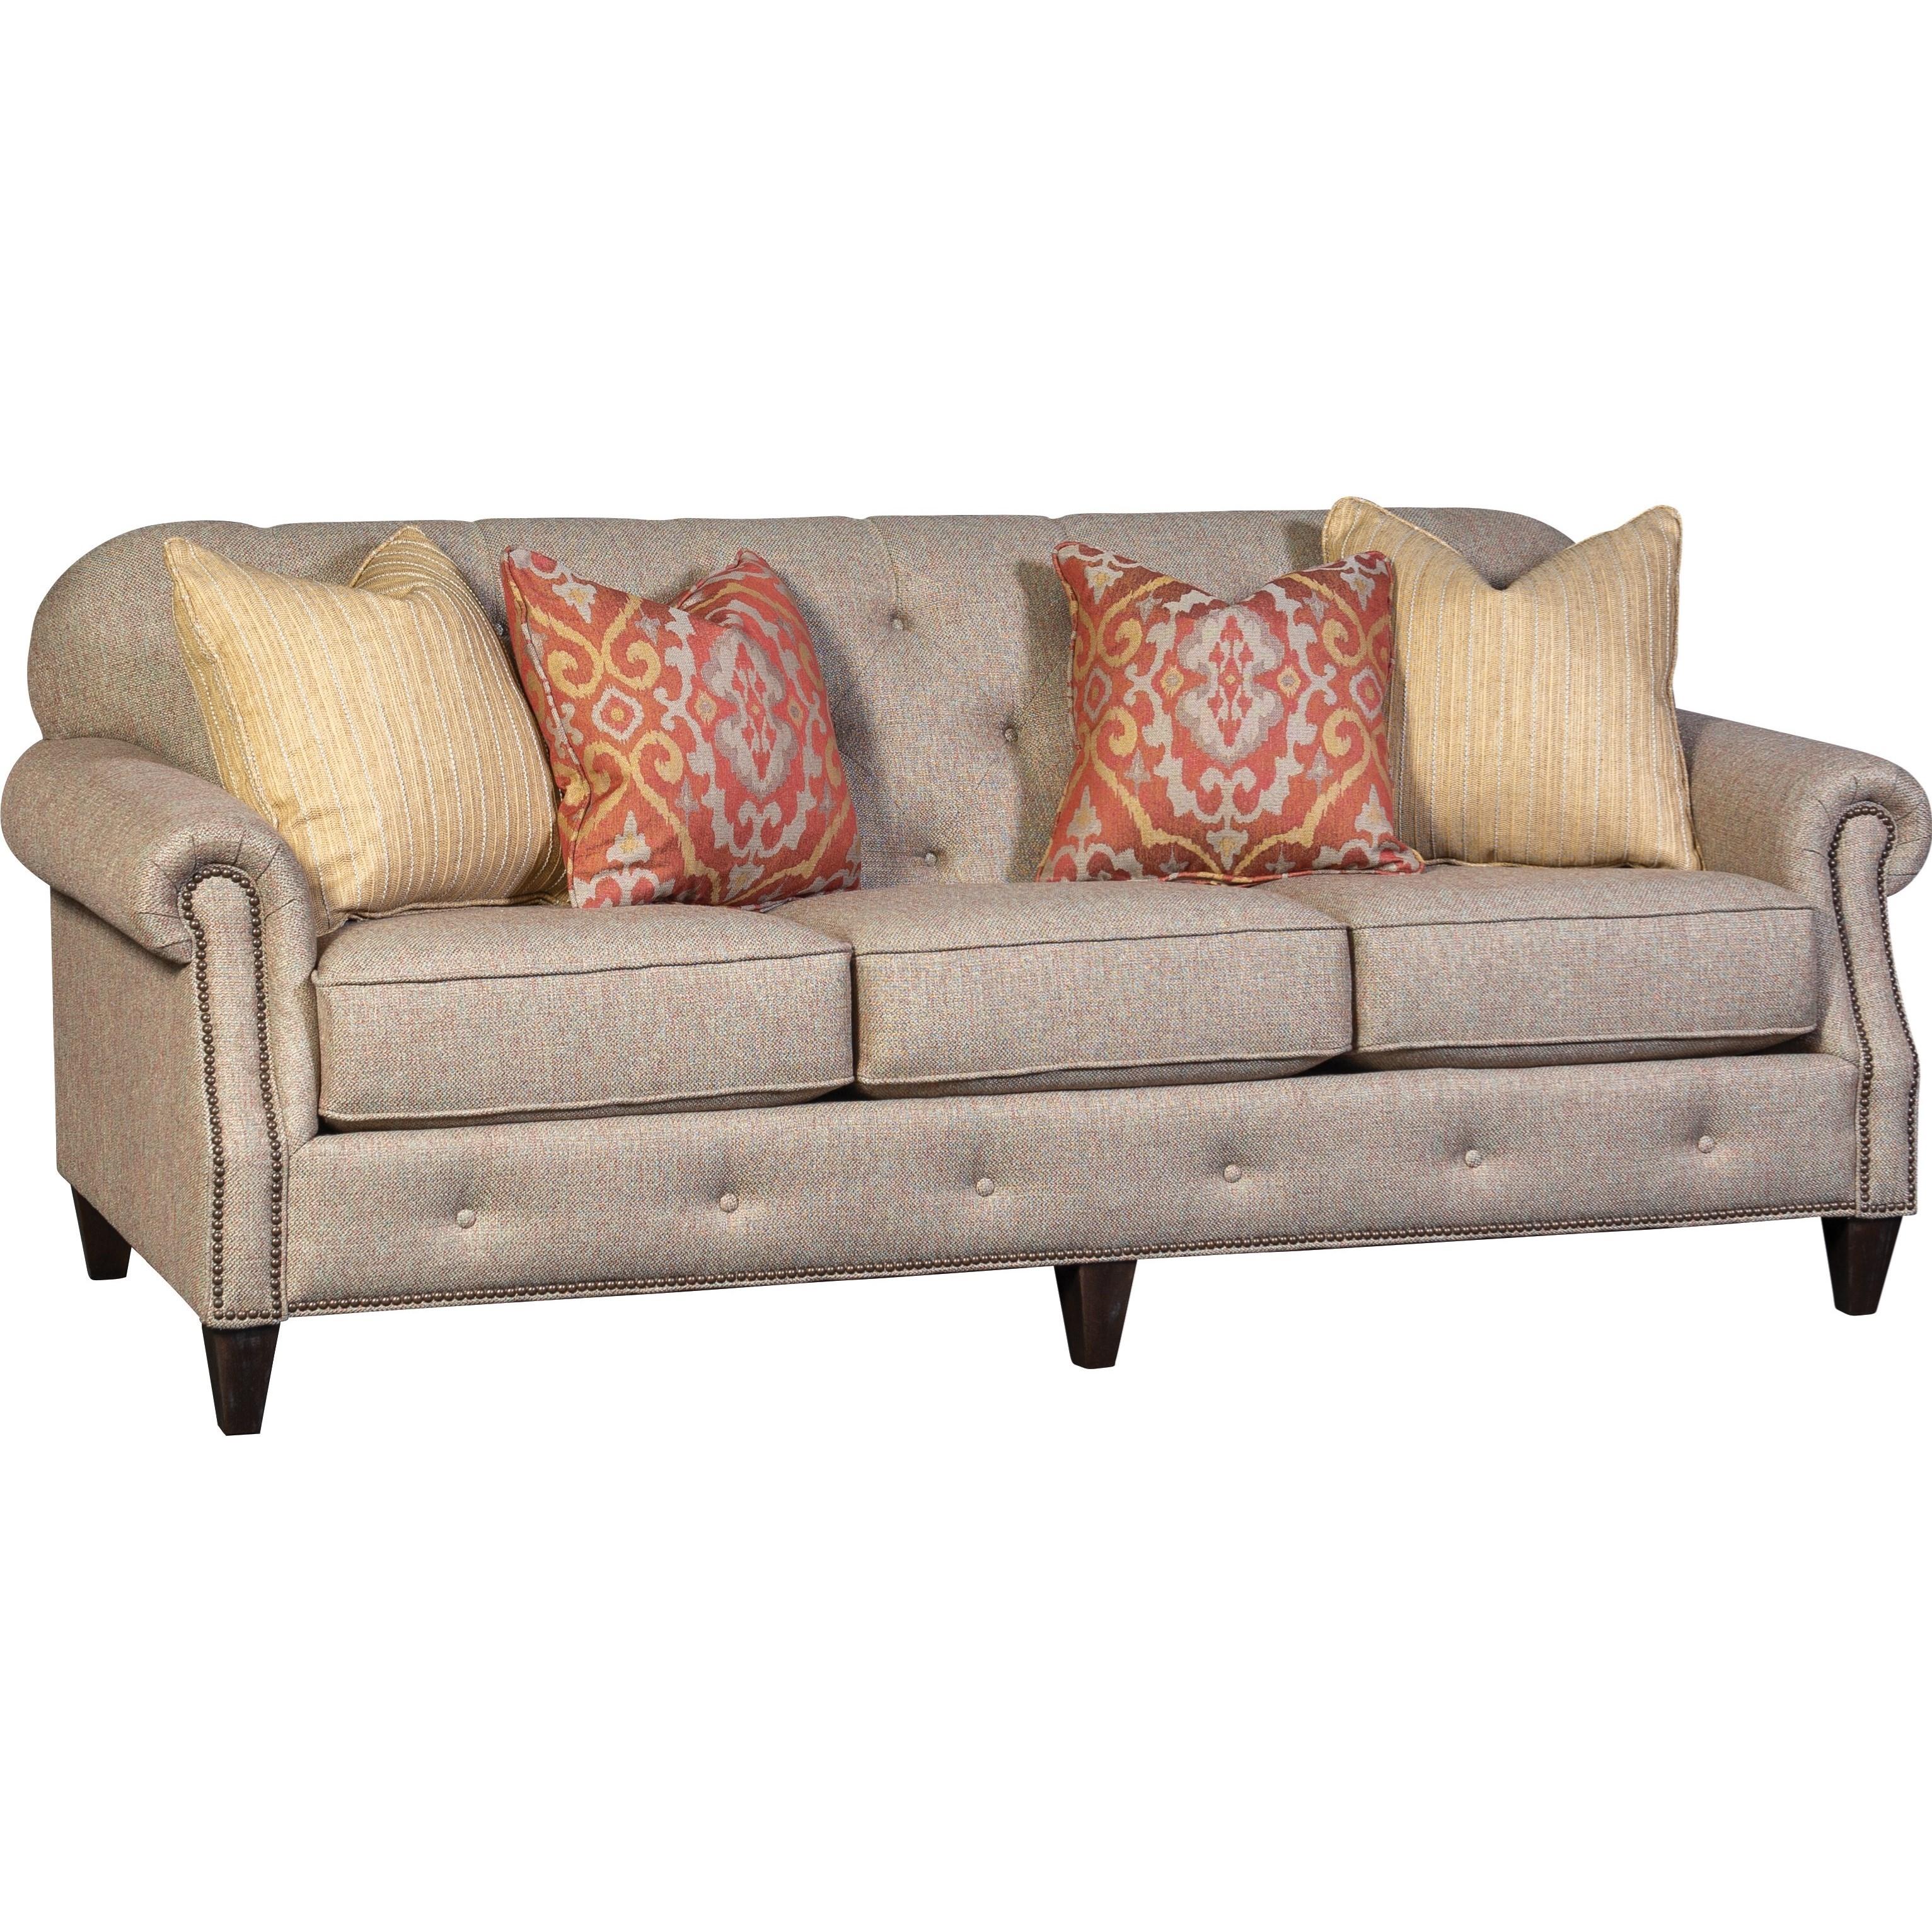 2262 Sofa by Mayo at Story & Lee Furniture